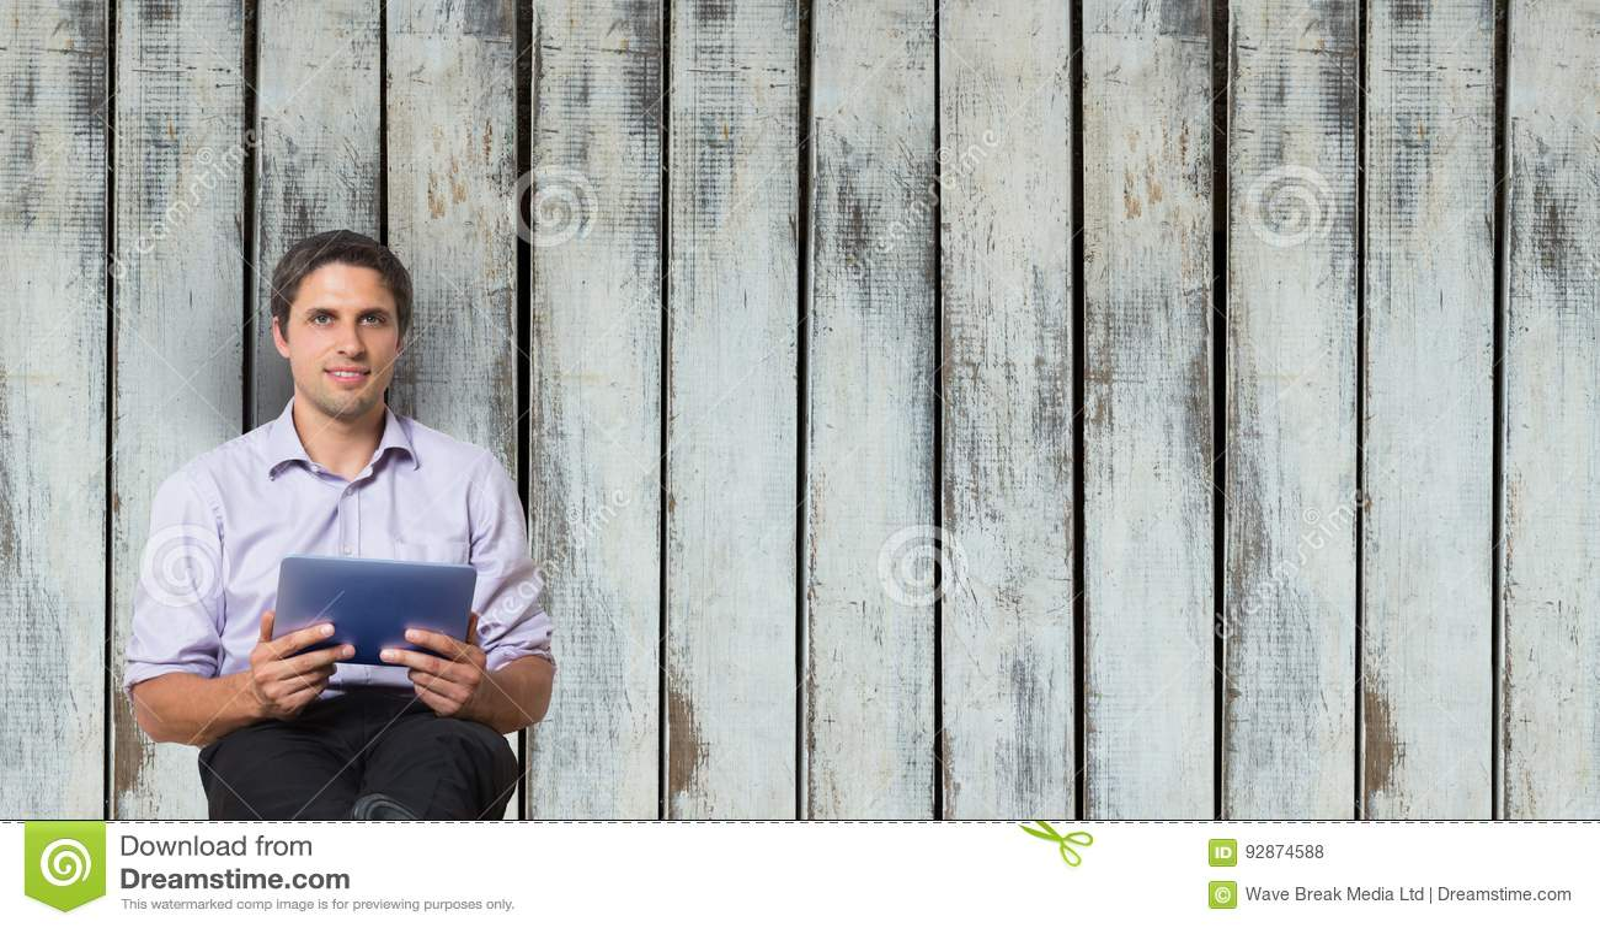 Businessman holding digital tablet against wooden wall